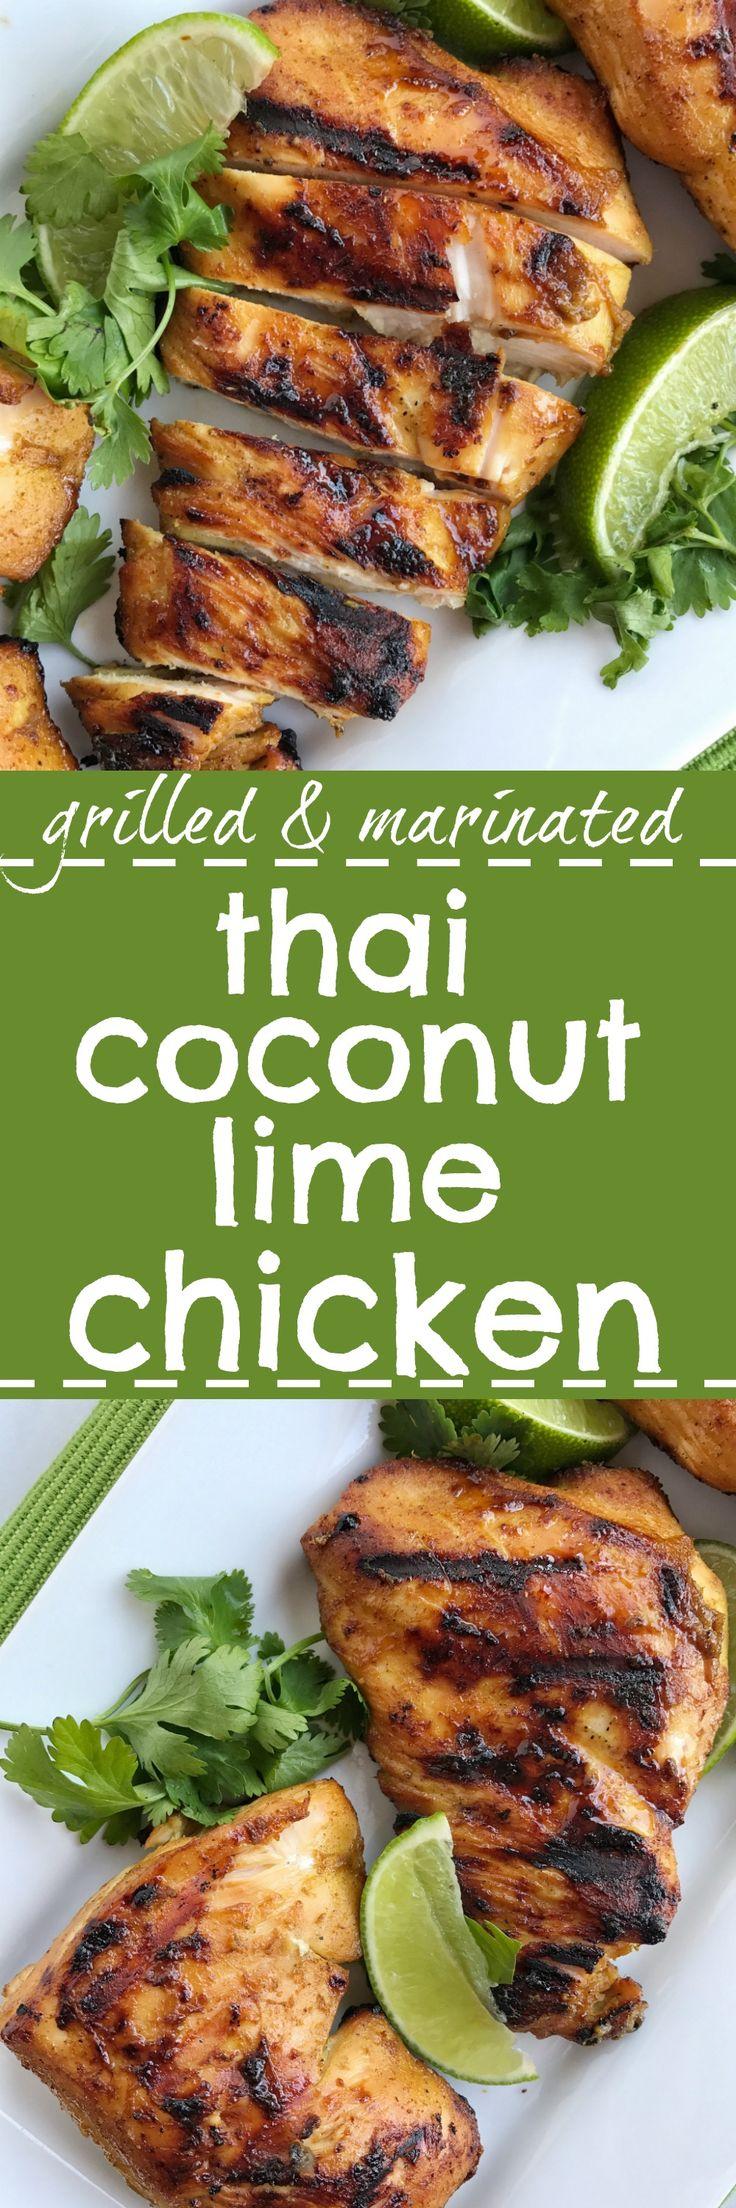 Best 25+ Grilled chicken rub ideas on Pinterest | Meat ...